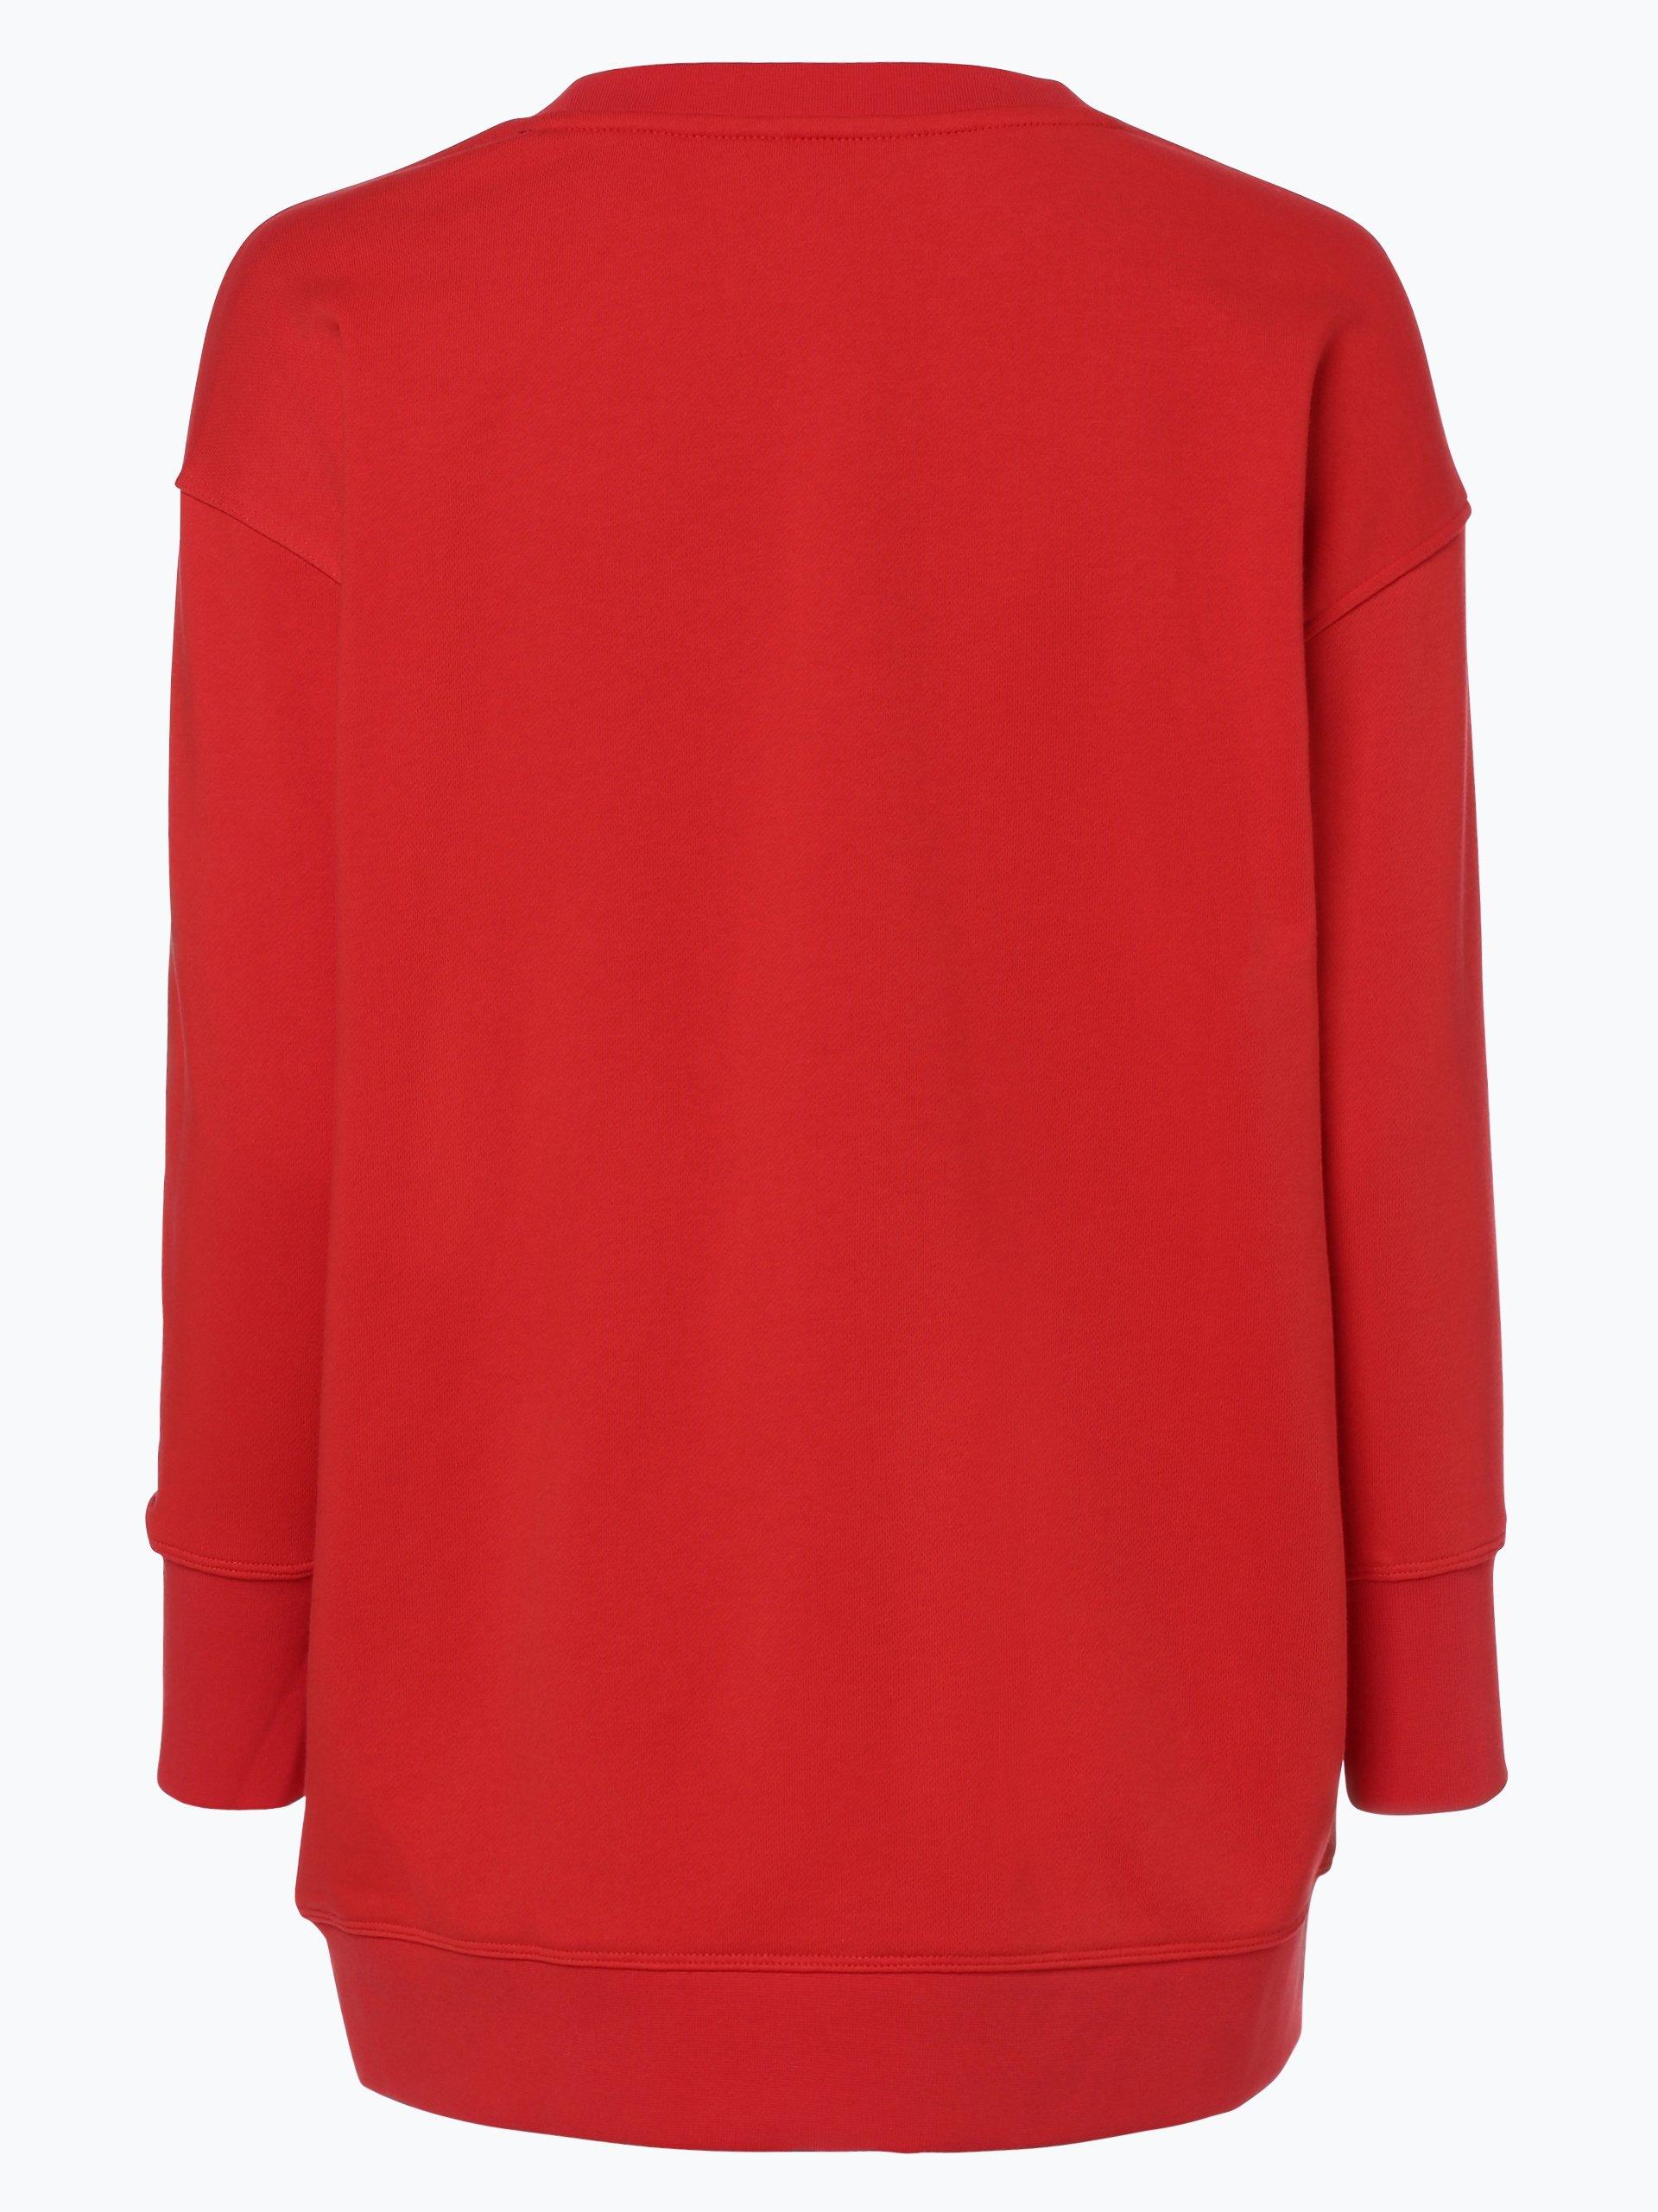 tommy hilfiger damen sweatshirt rot uni online kaufen. Black Bedroom Furniture Sets. Home Design Ideas